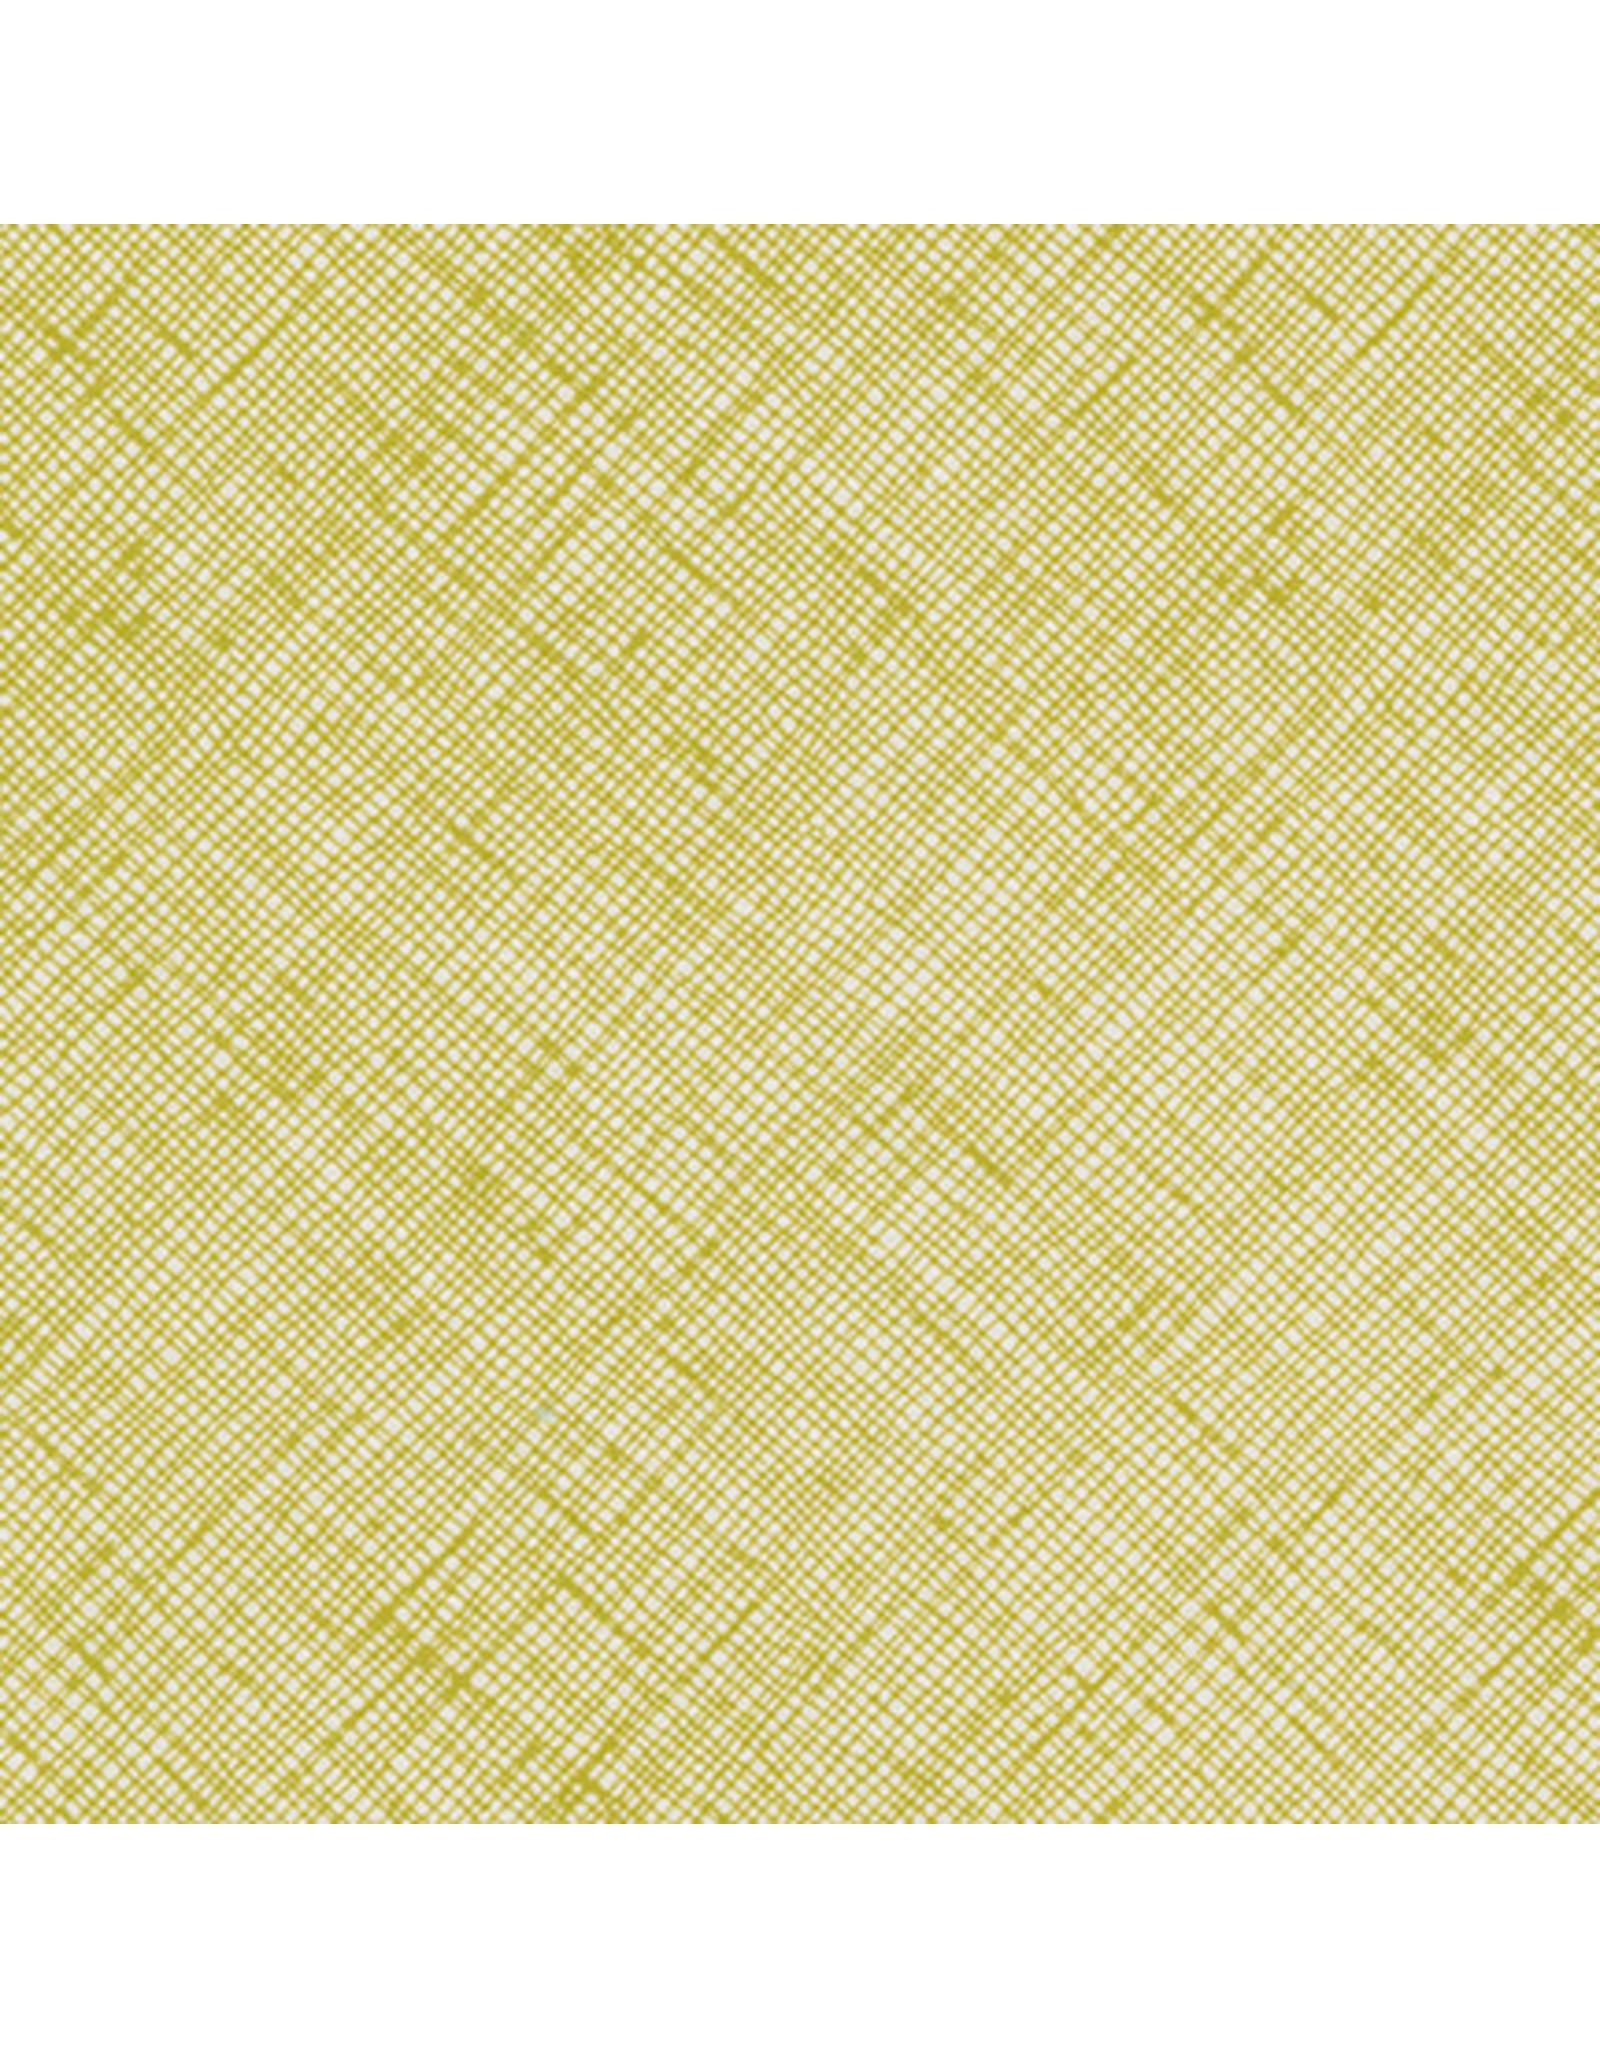 Robert Kaufman Carolyn Friedlander - Architextures Pickle